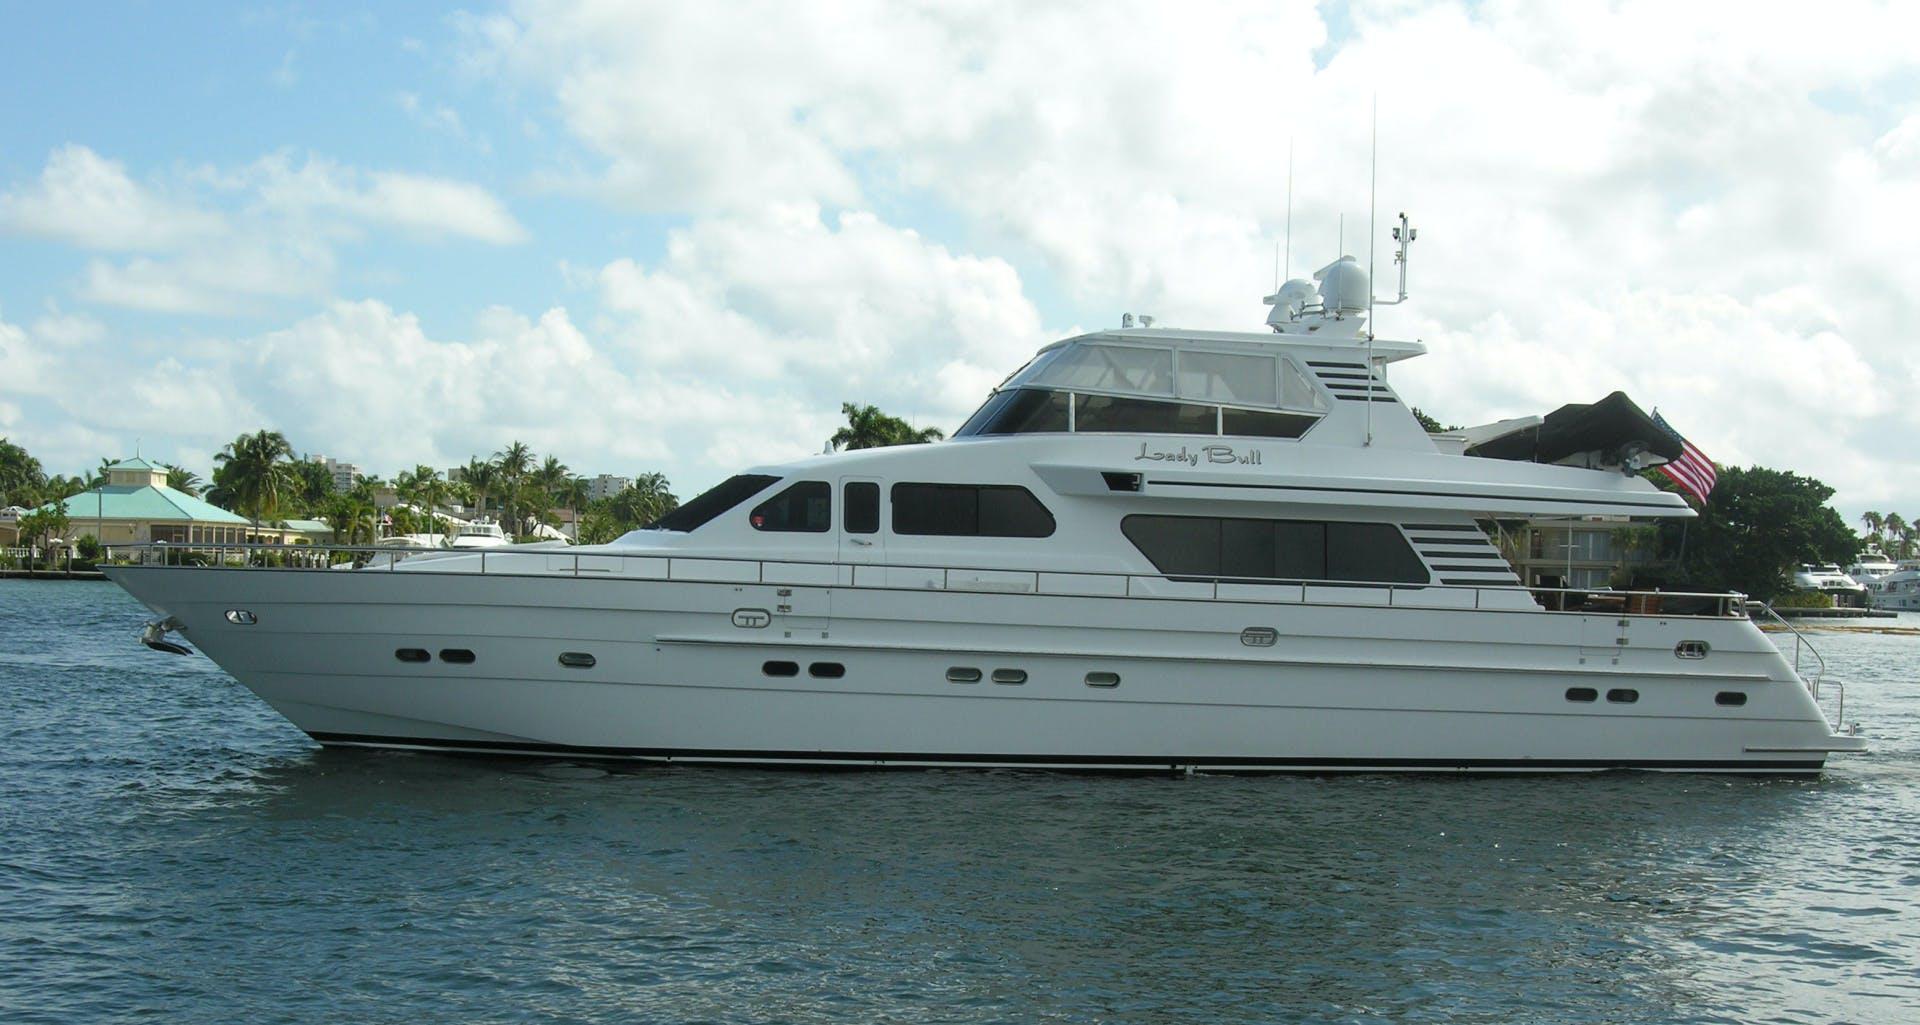 2001 Horizon 82' Flybridge Motor Yacht LADY BULL | Picture 1 of 88